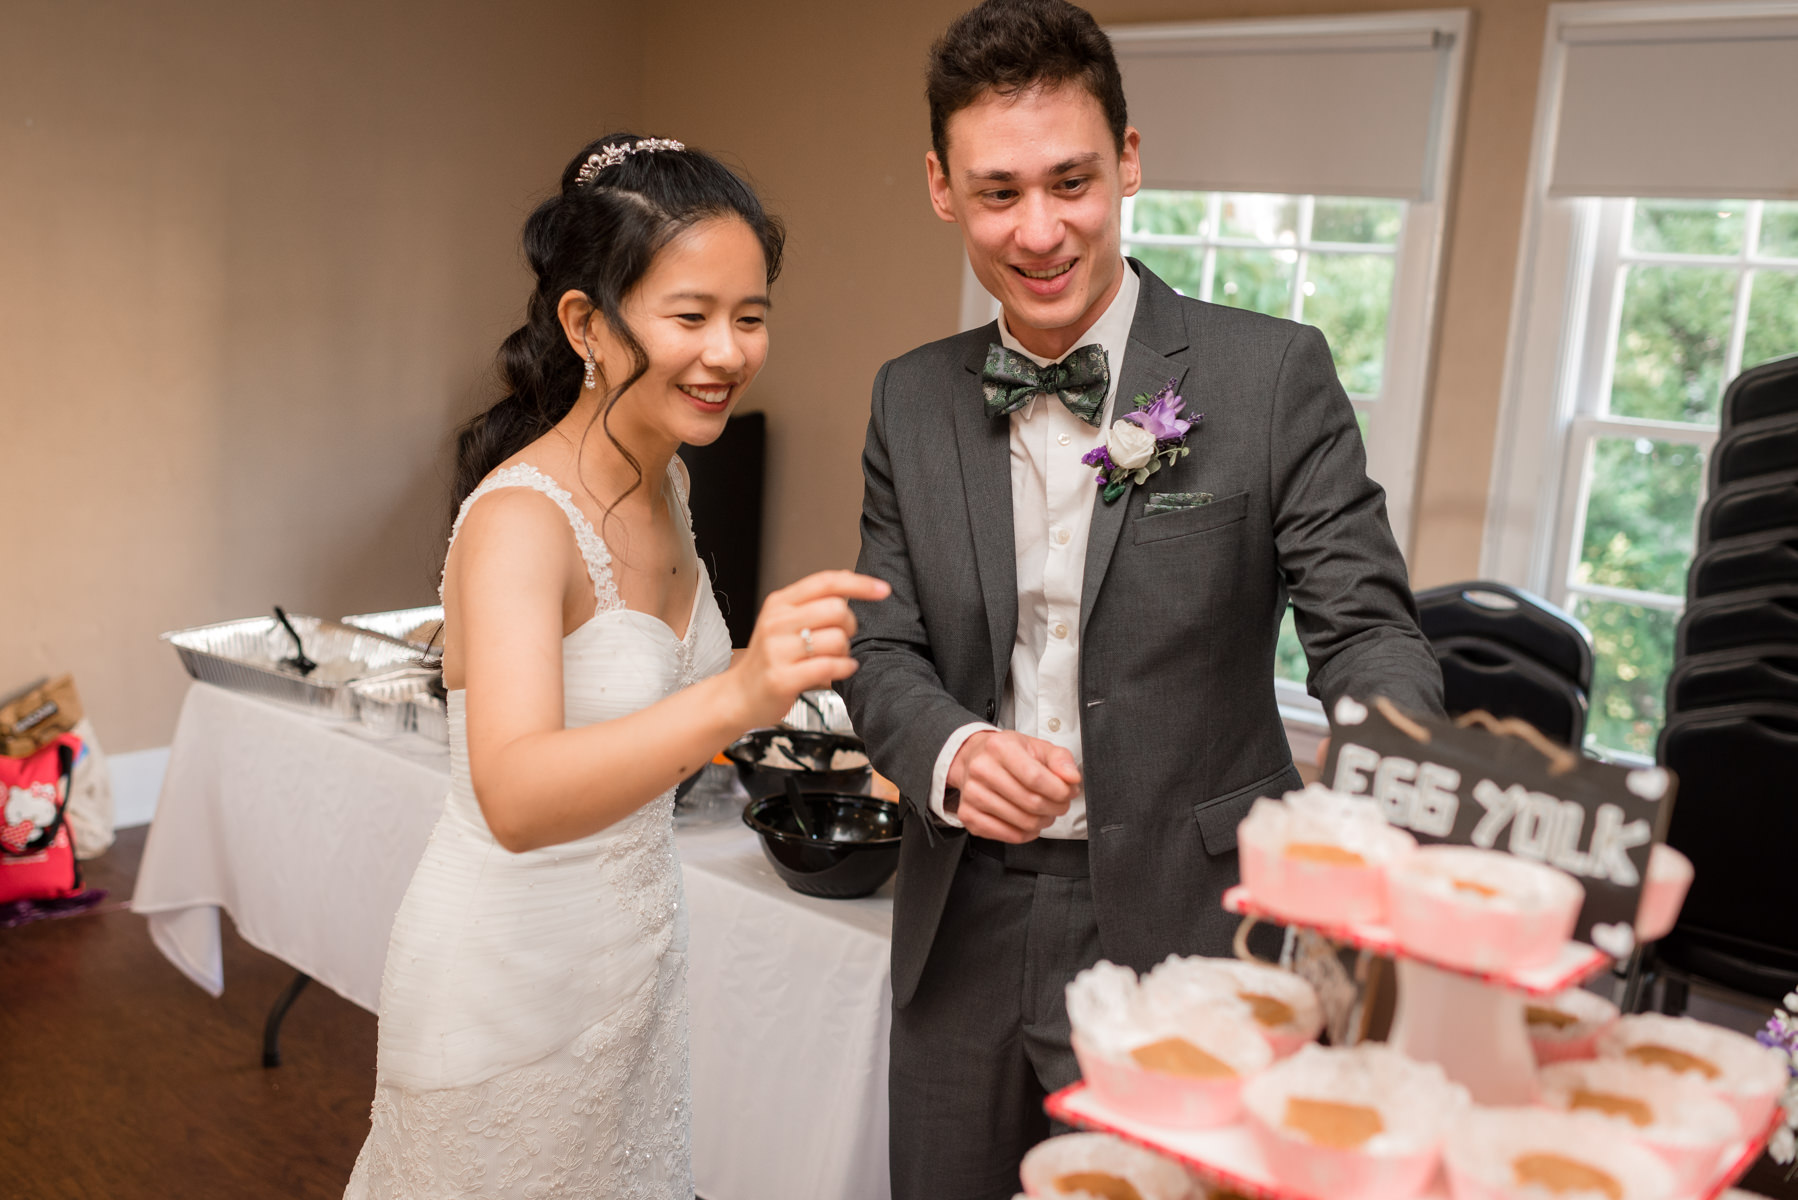 Andrew Tat - Documentary Wedding Photography - Heritage Hall - Kirkland, Washington - Grace & James - 69.JPG